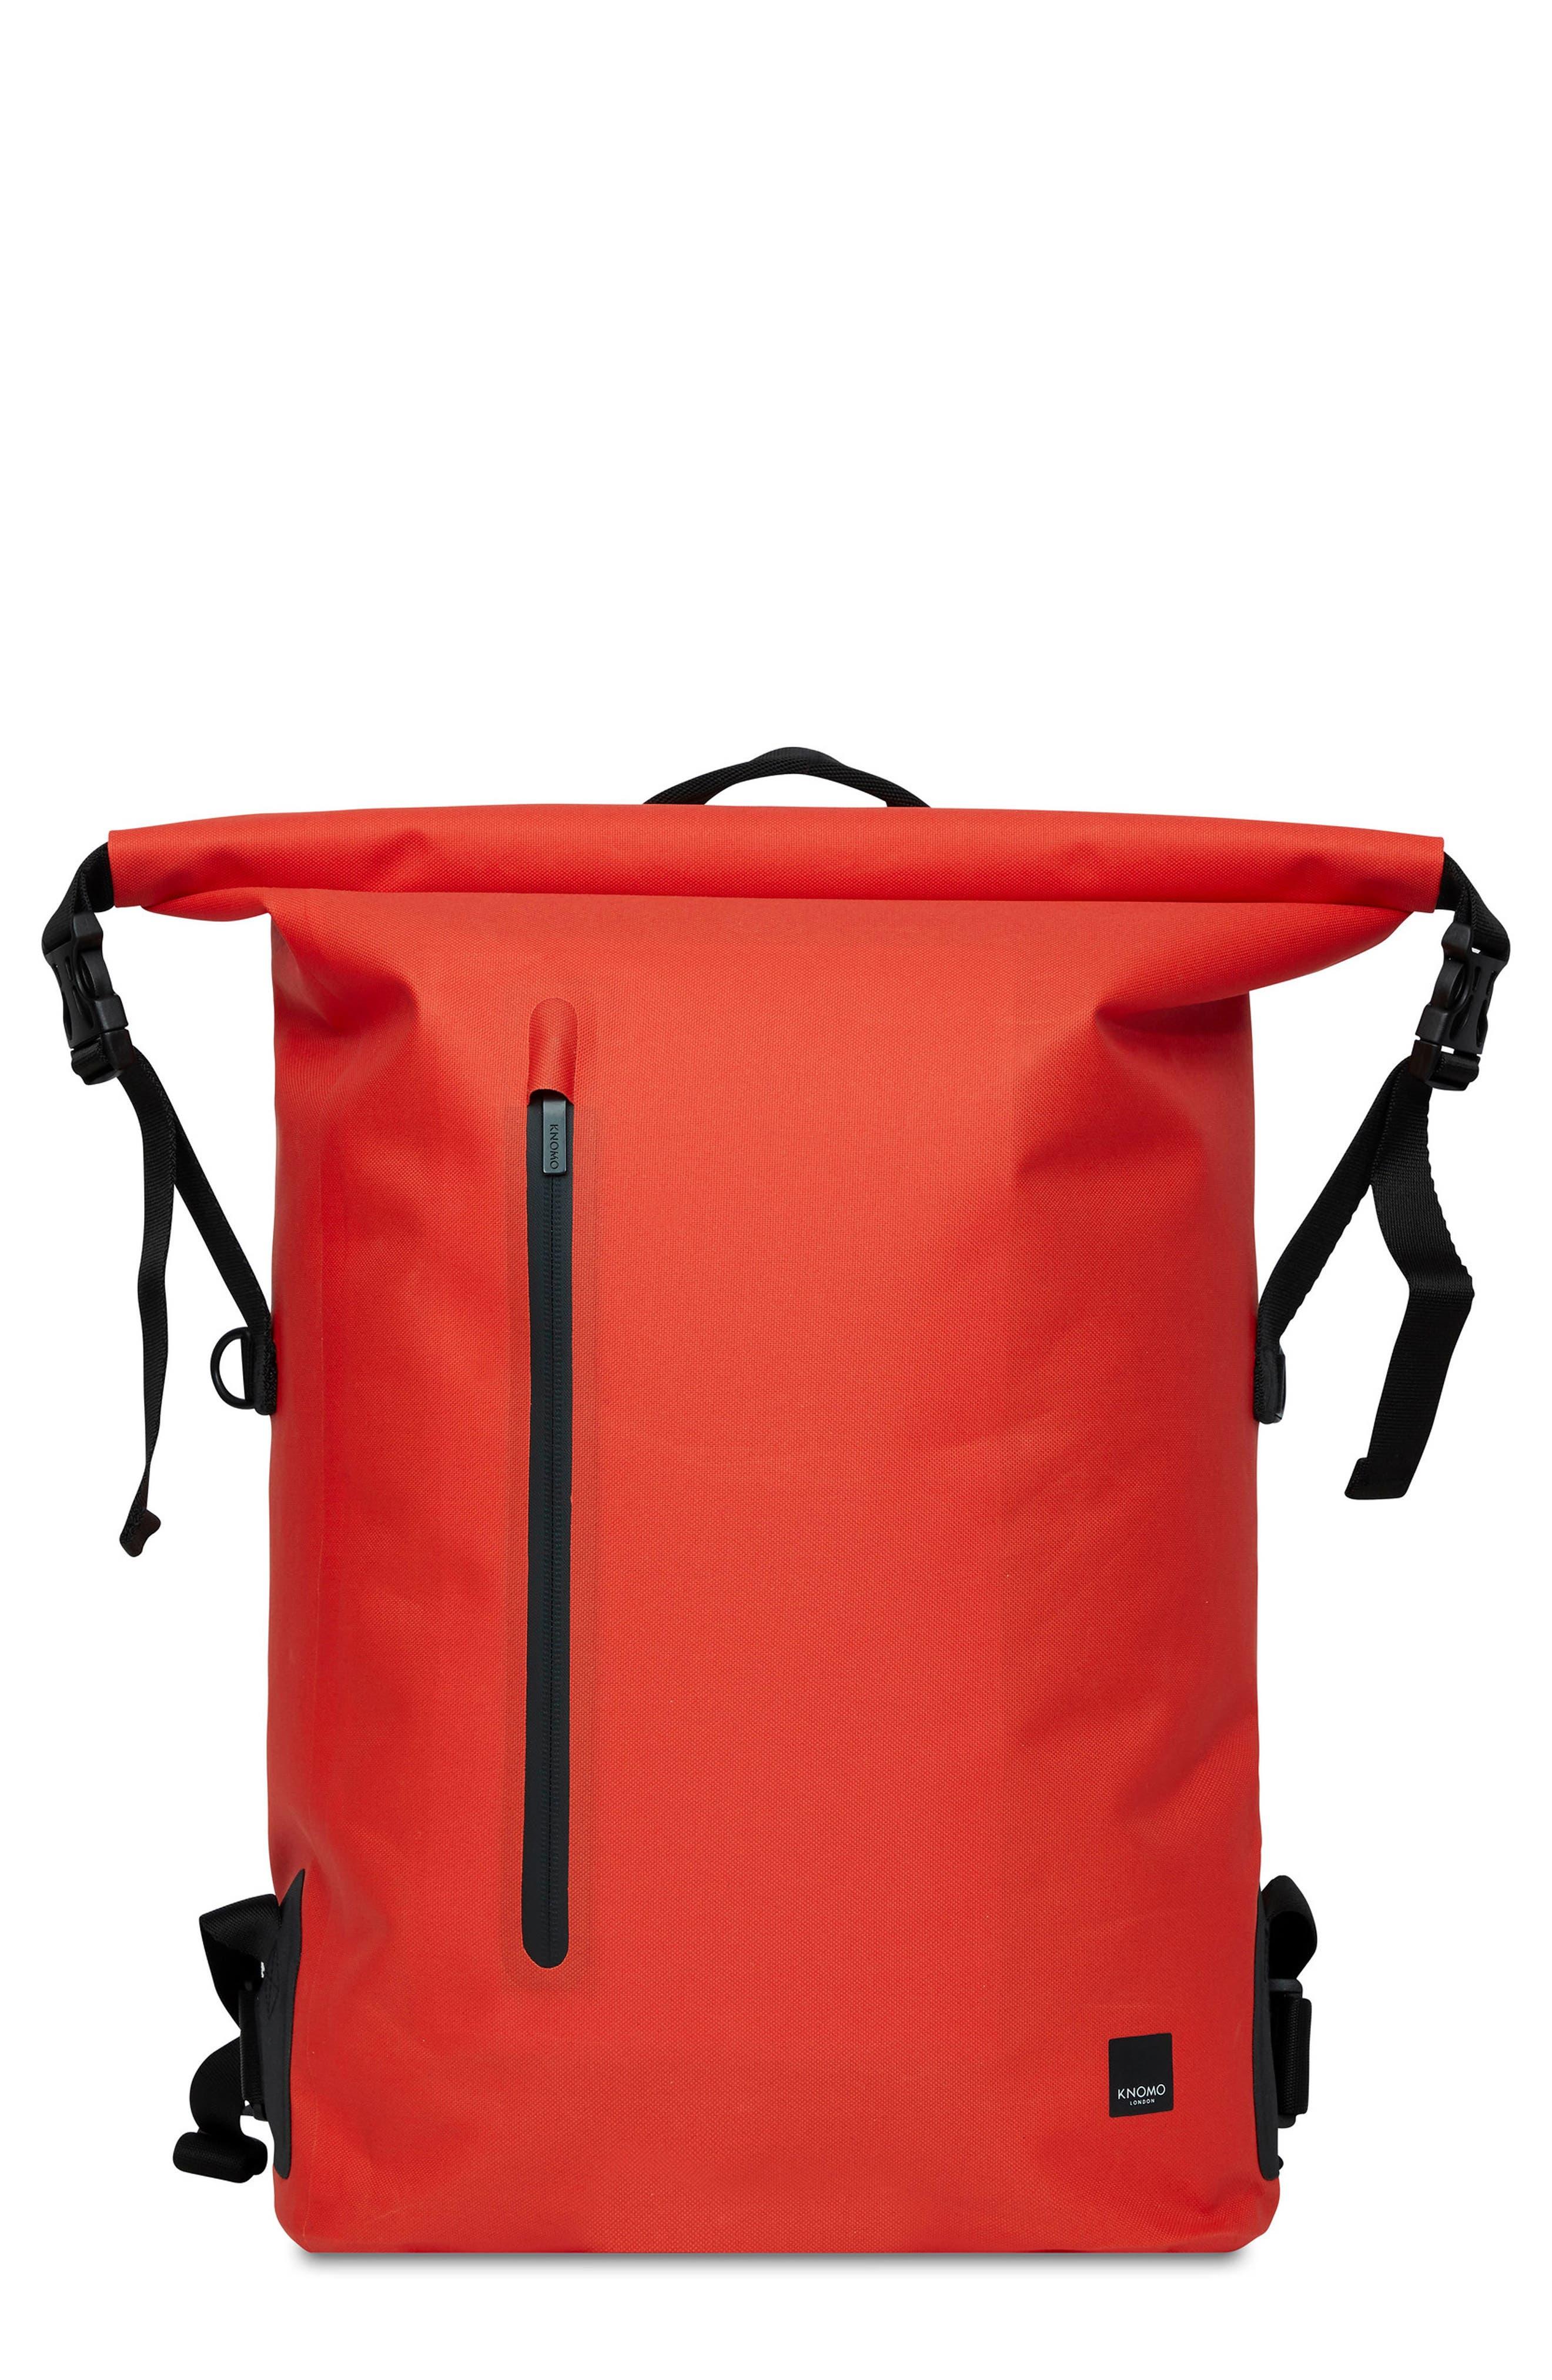 Knomo London Thames Cromwell Roll Top Backpack - Orange